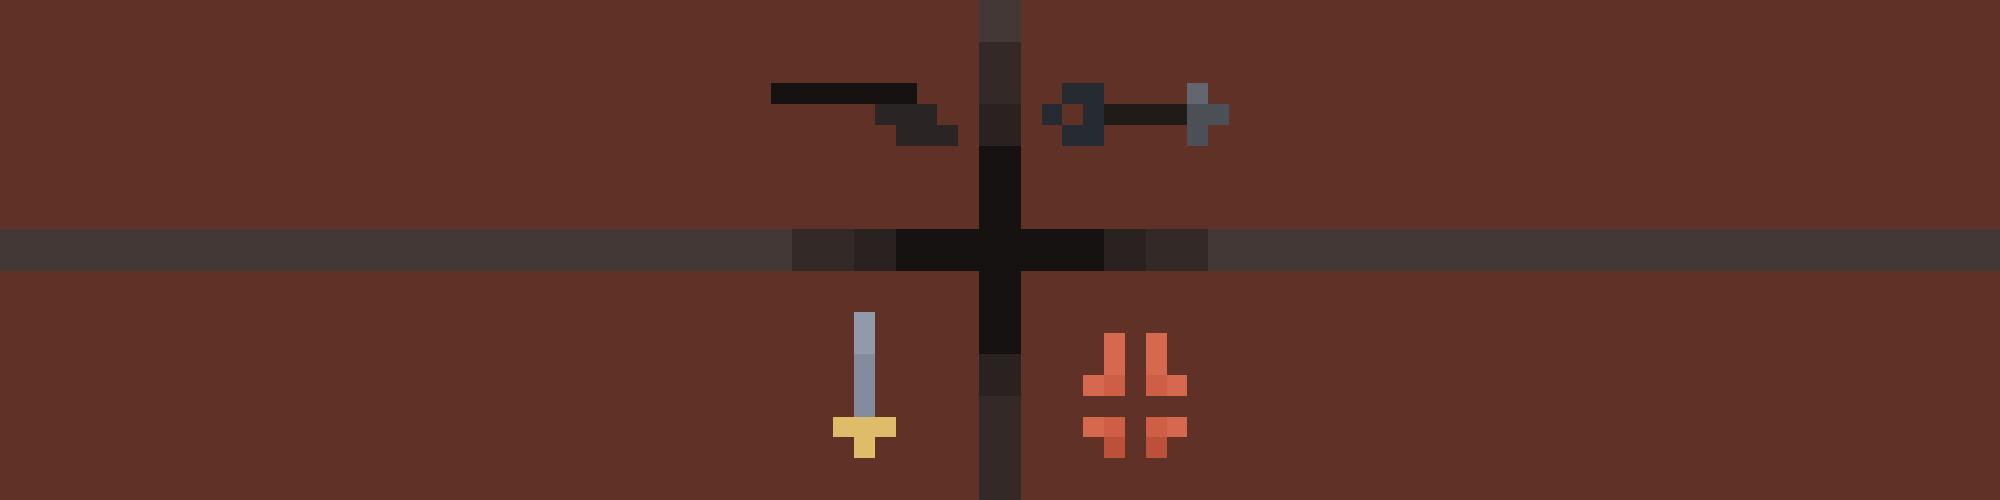 Hooks And Shotguns